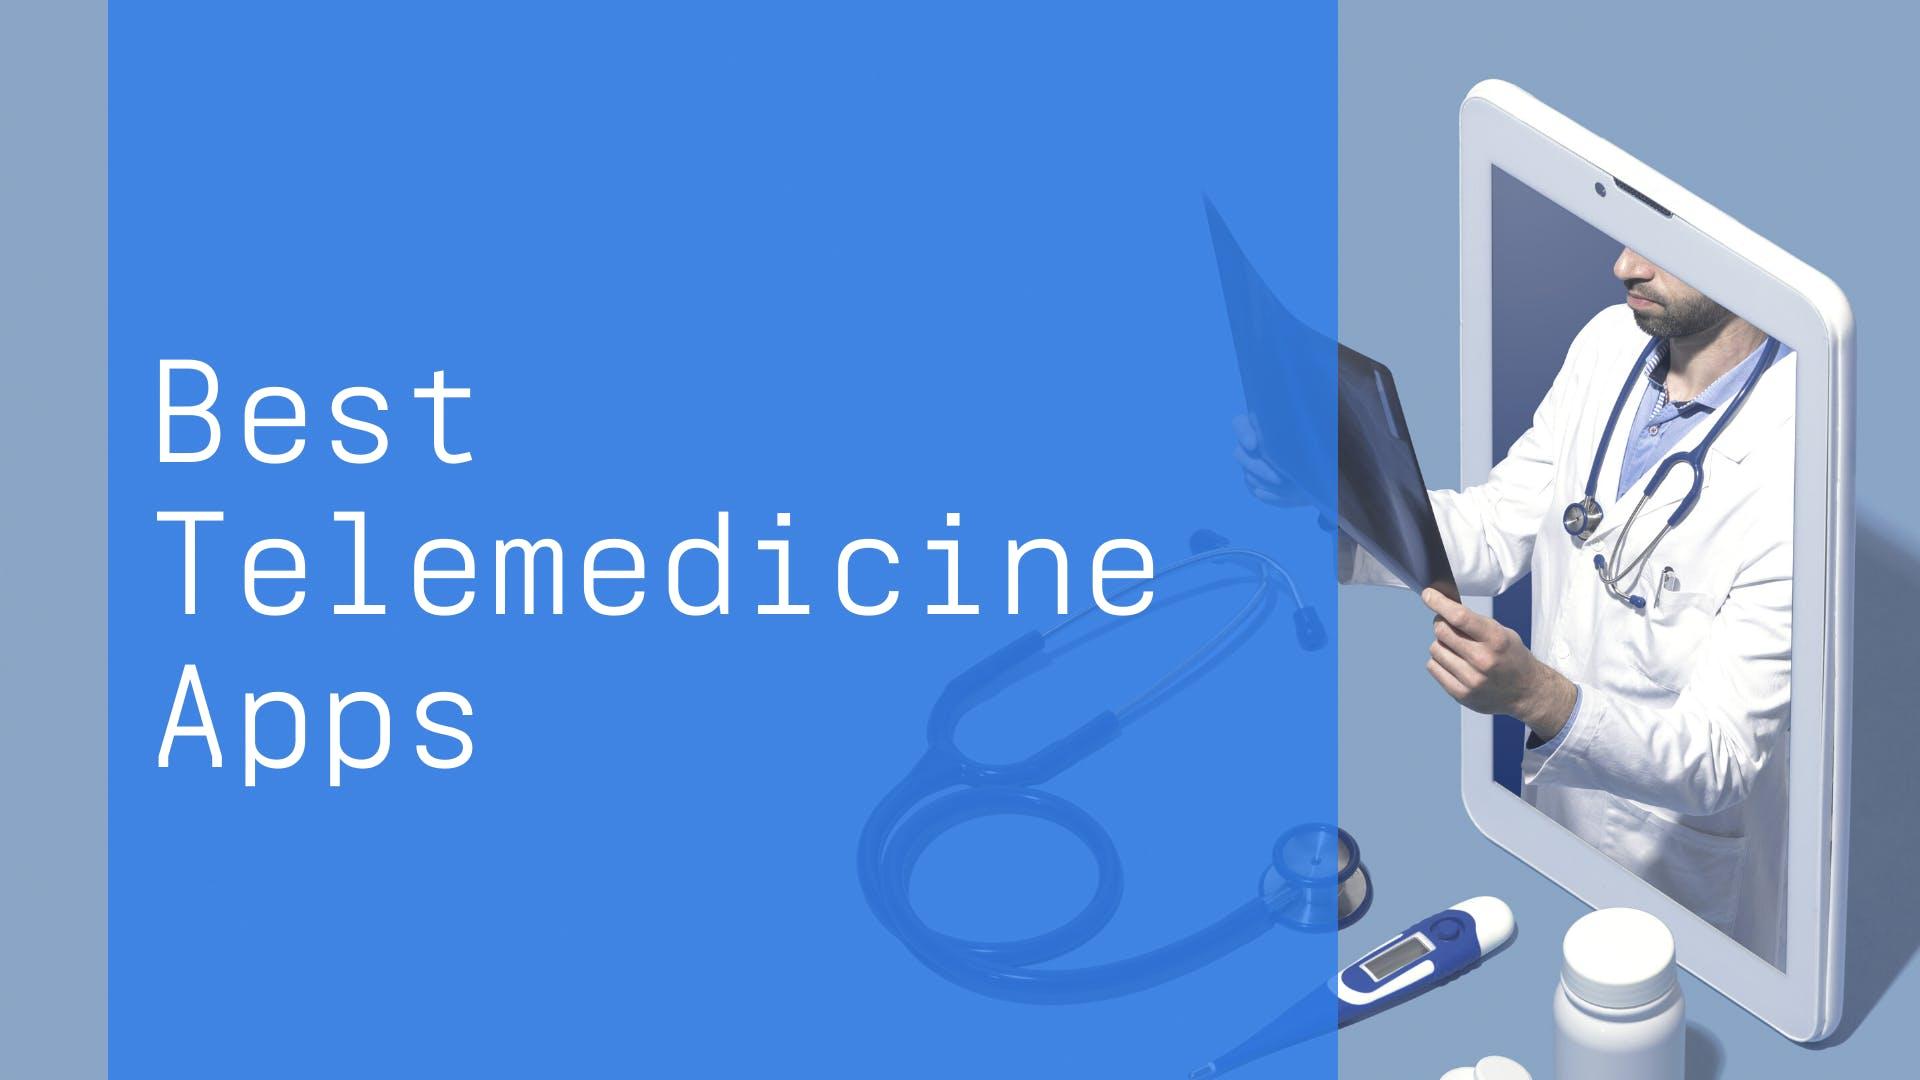 Best Telemedicine Apps & Software Platforms for Providers